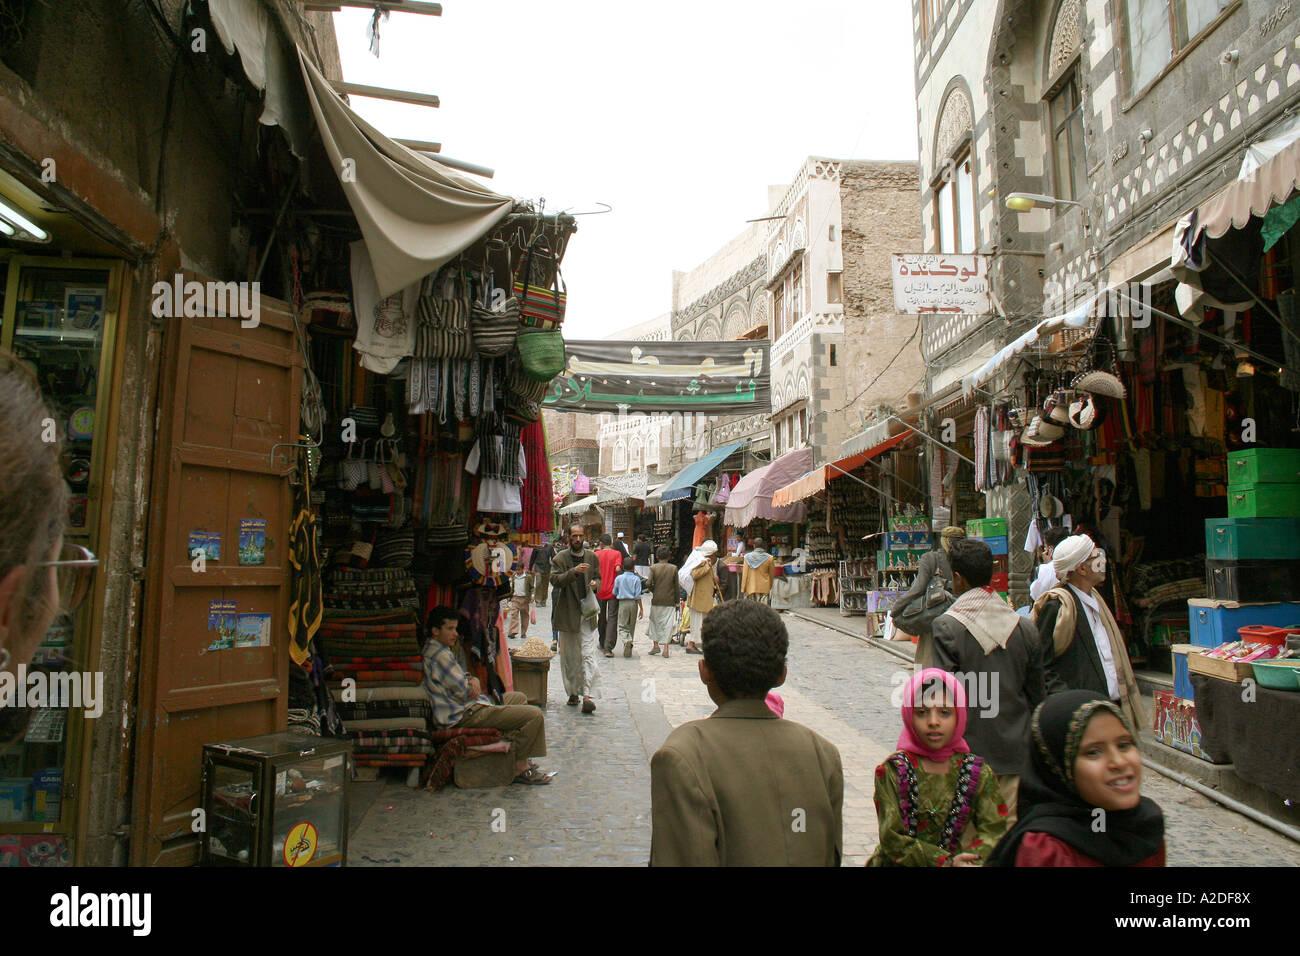 Busy street Sana Yemen - Stock Image